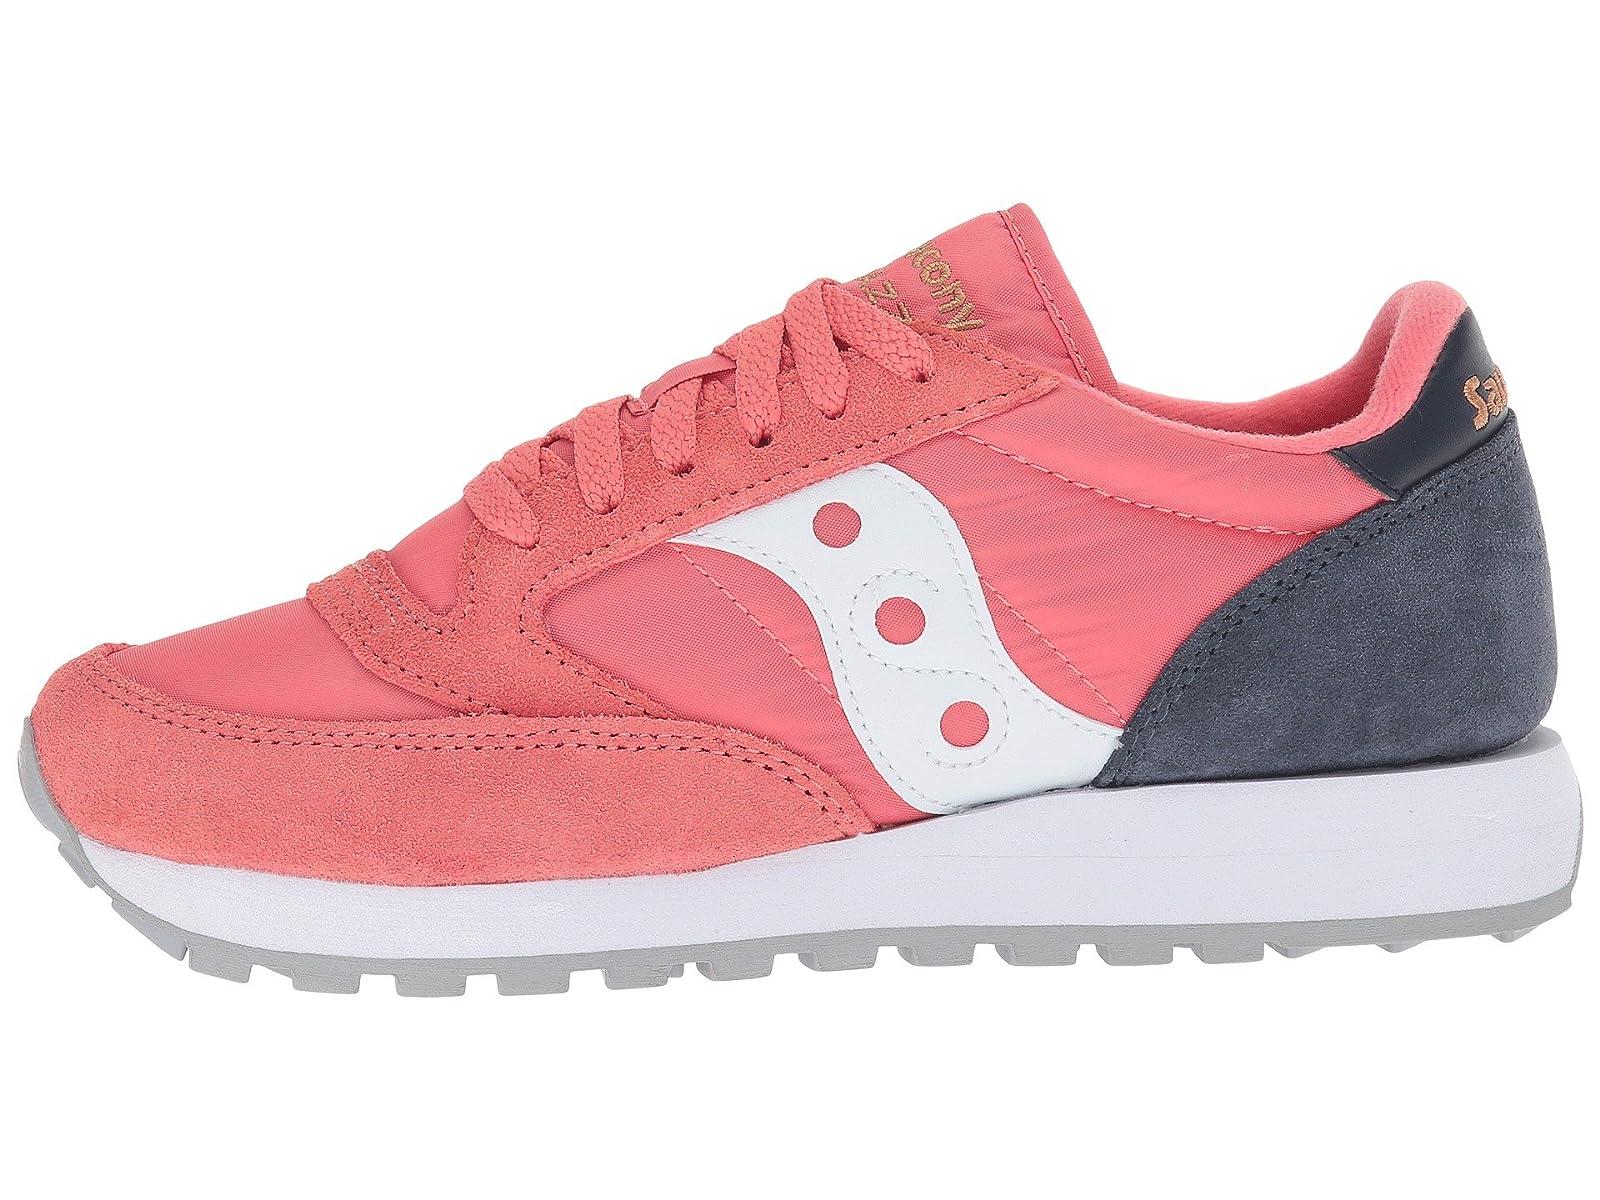 Woman-039-s-Sneakers-amp-Athletic-Shoes-Saucony-Originals-Jazz-Original thumbnail 26